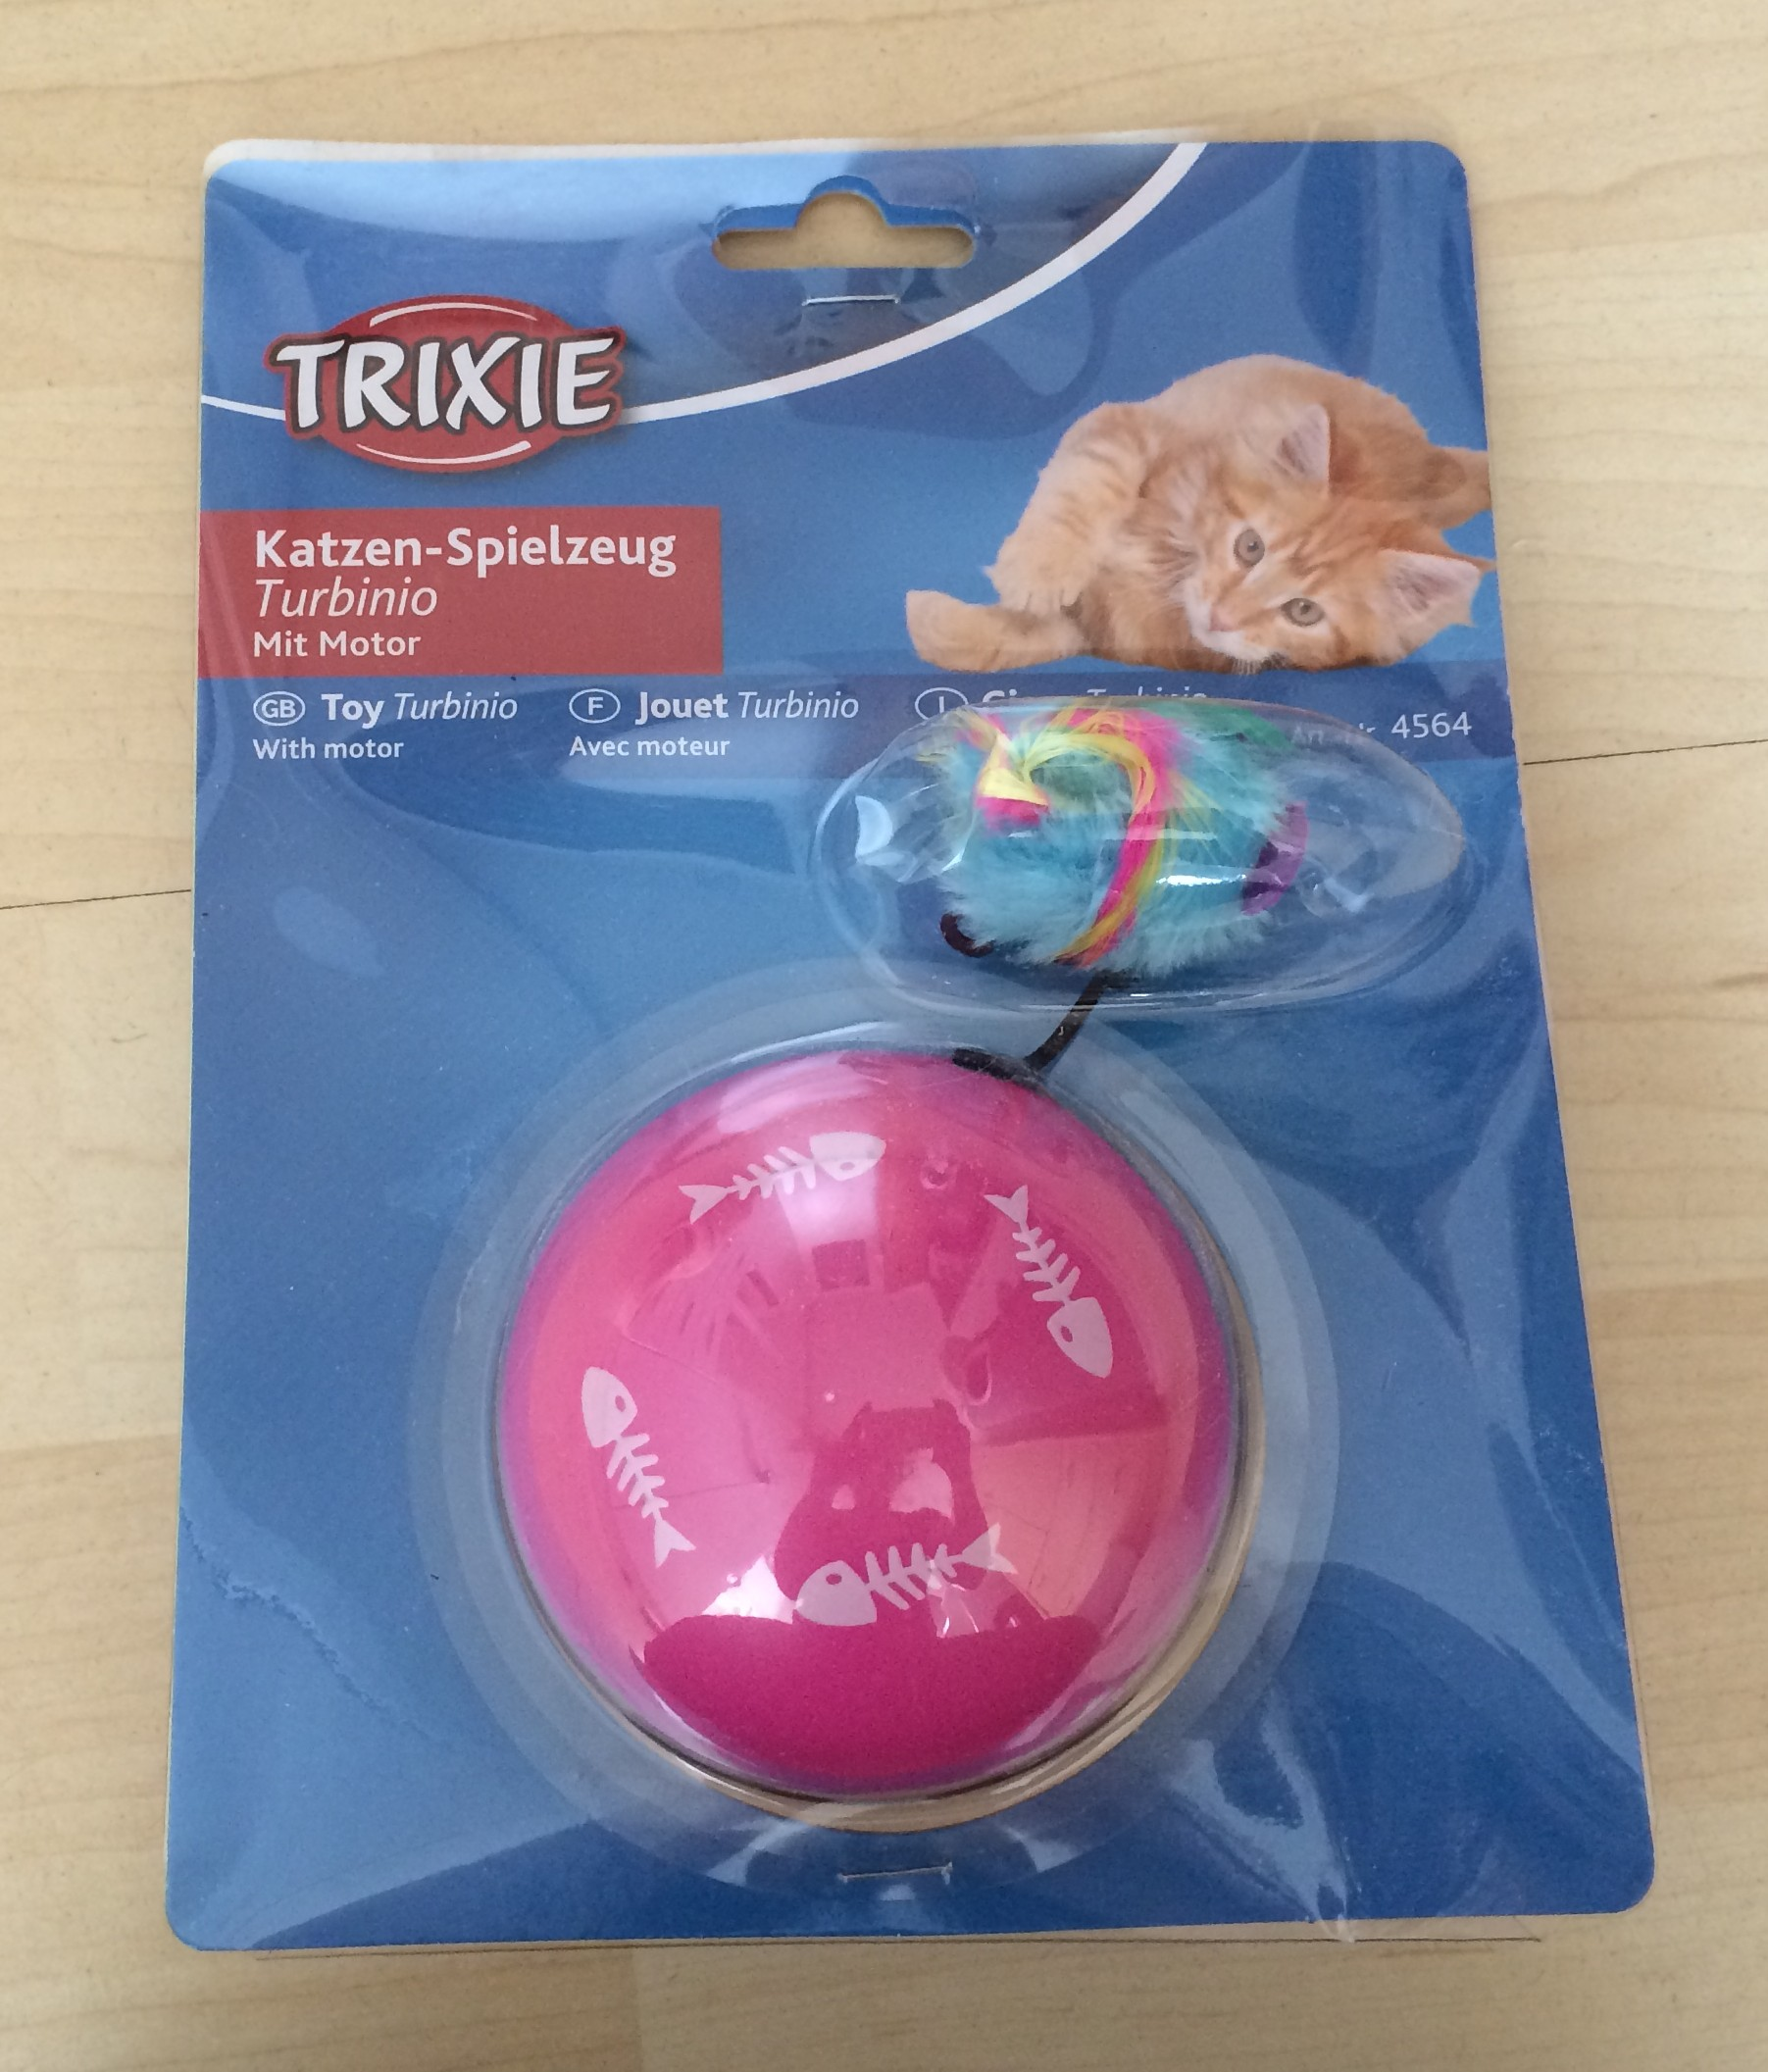 Katzen-Spielzeug Turbinio von TRIXIE